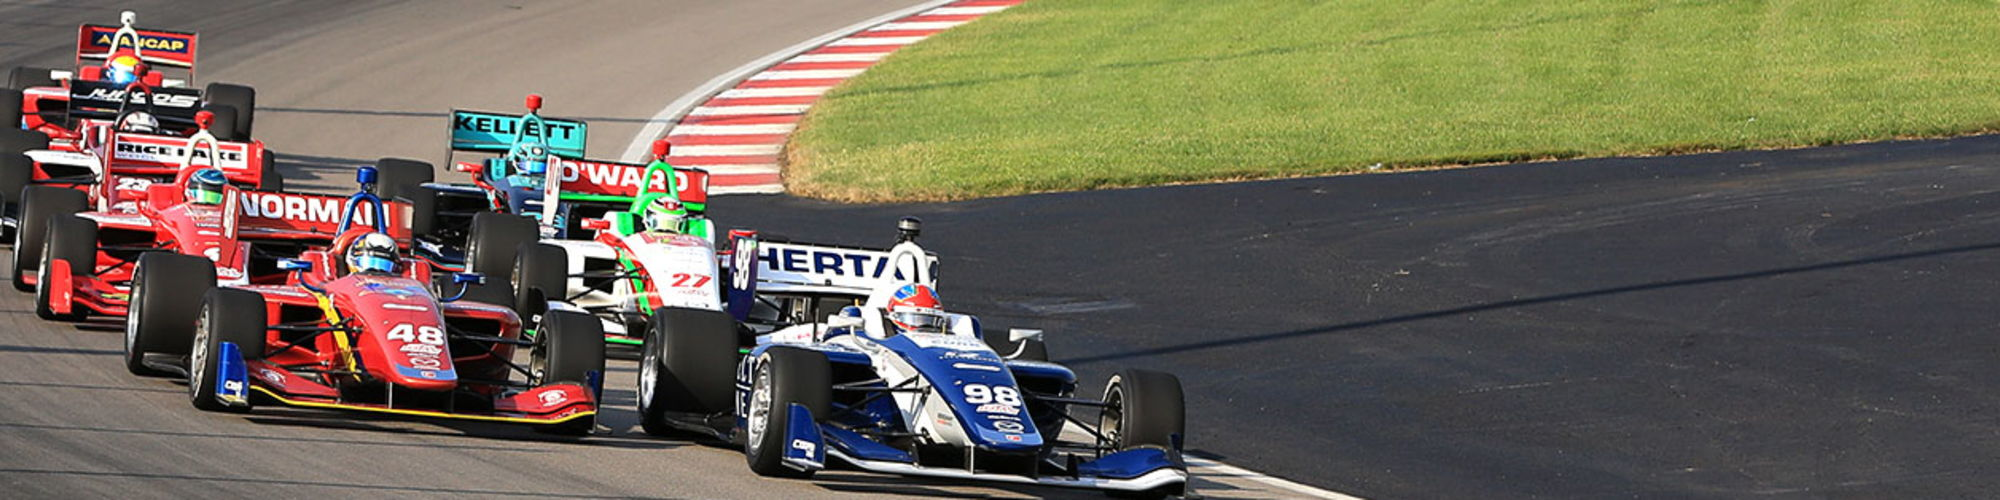 Gateway Motorsports Park cover image